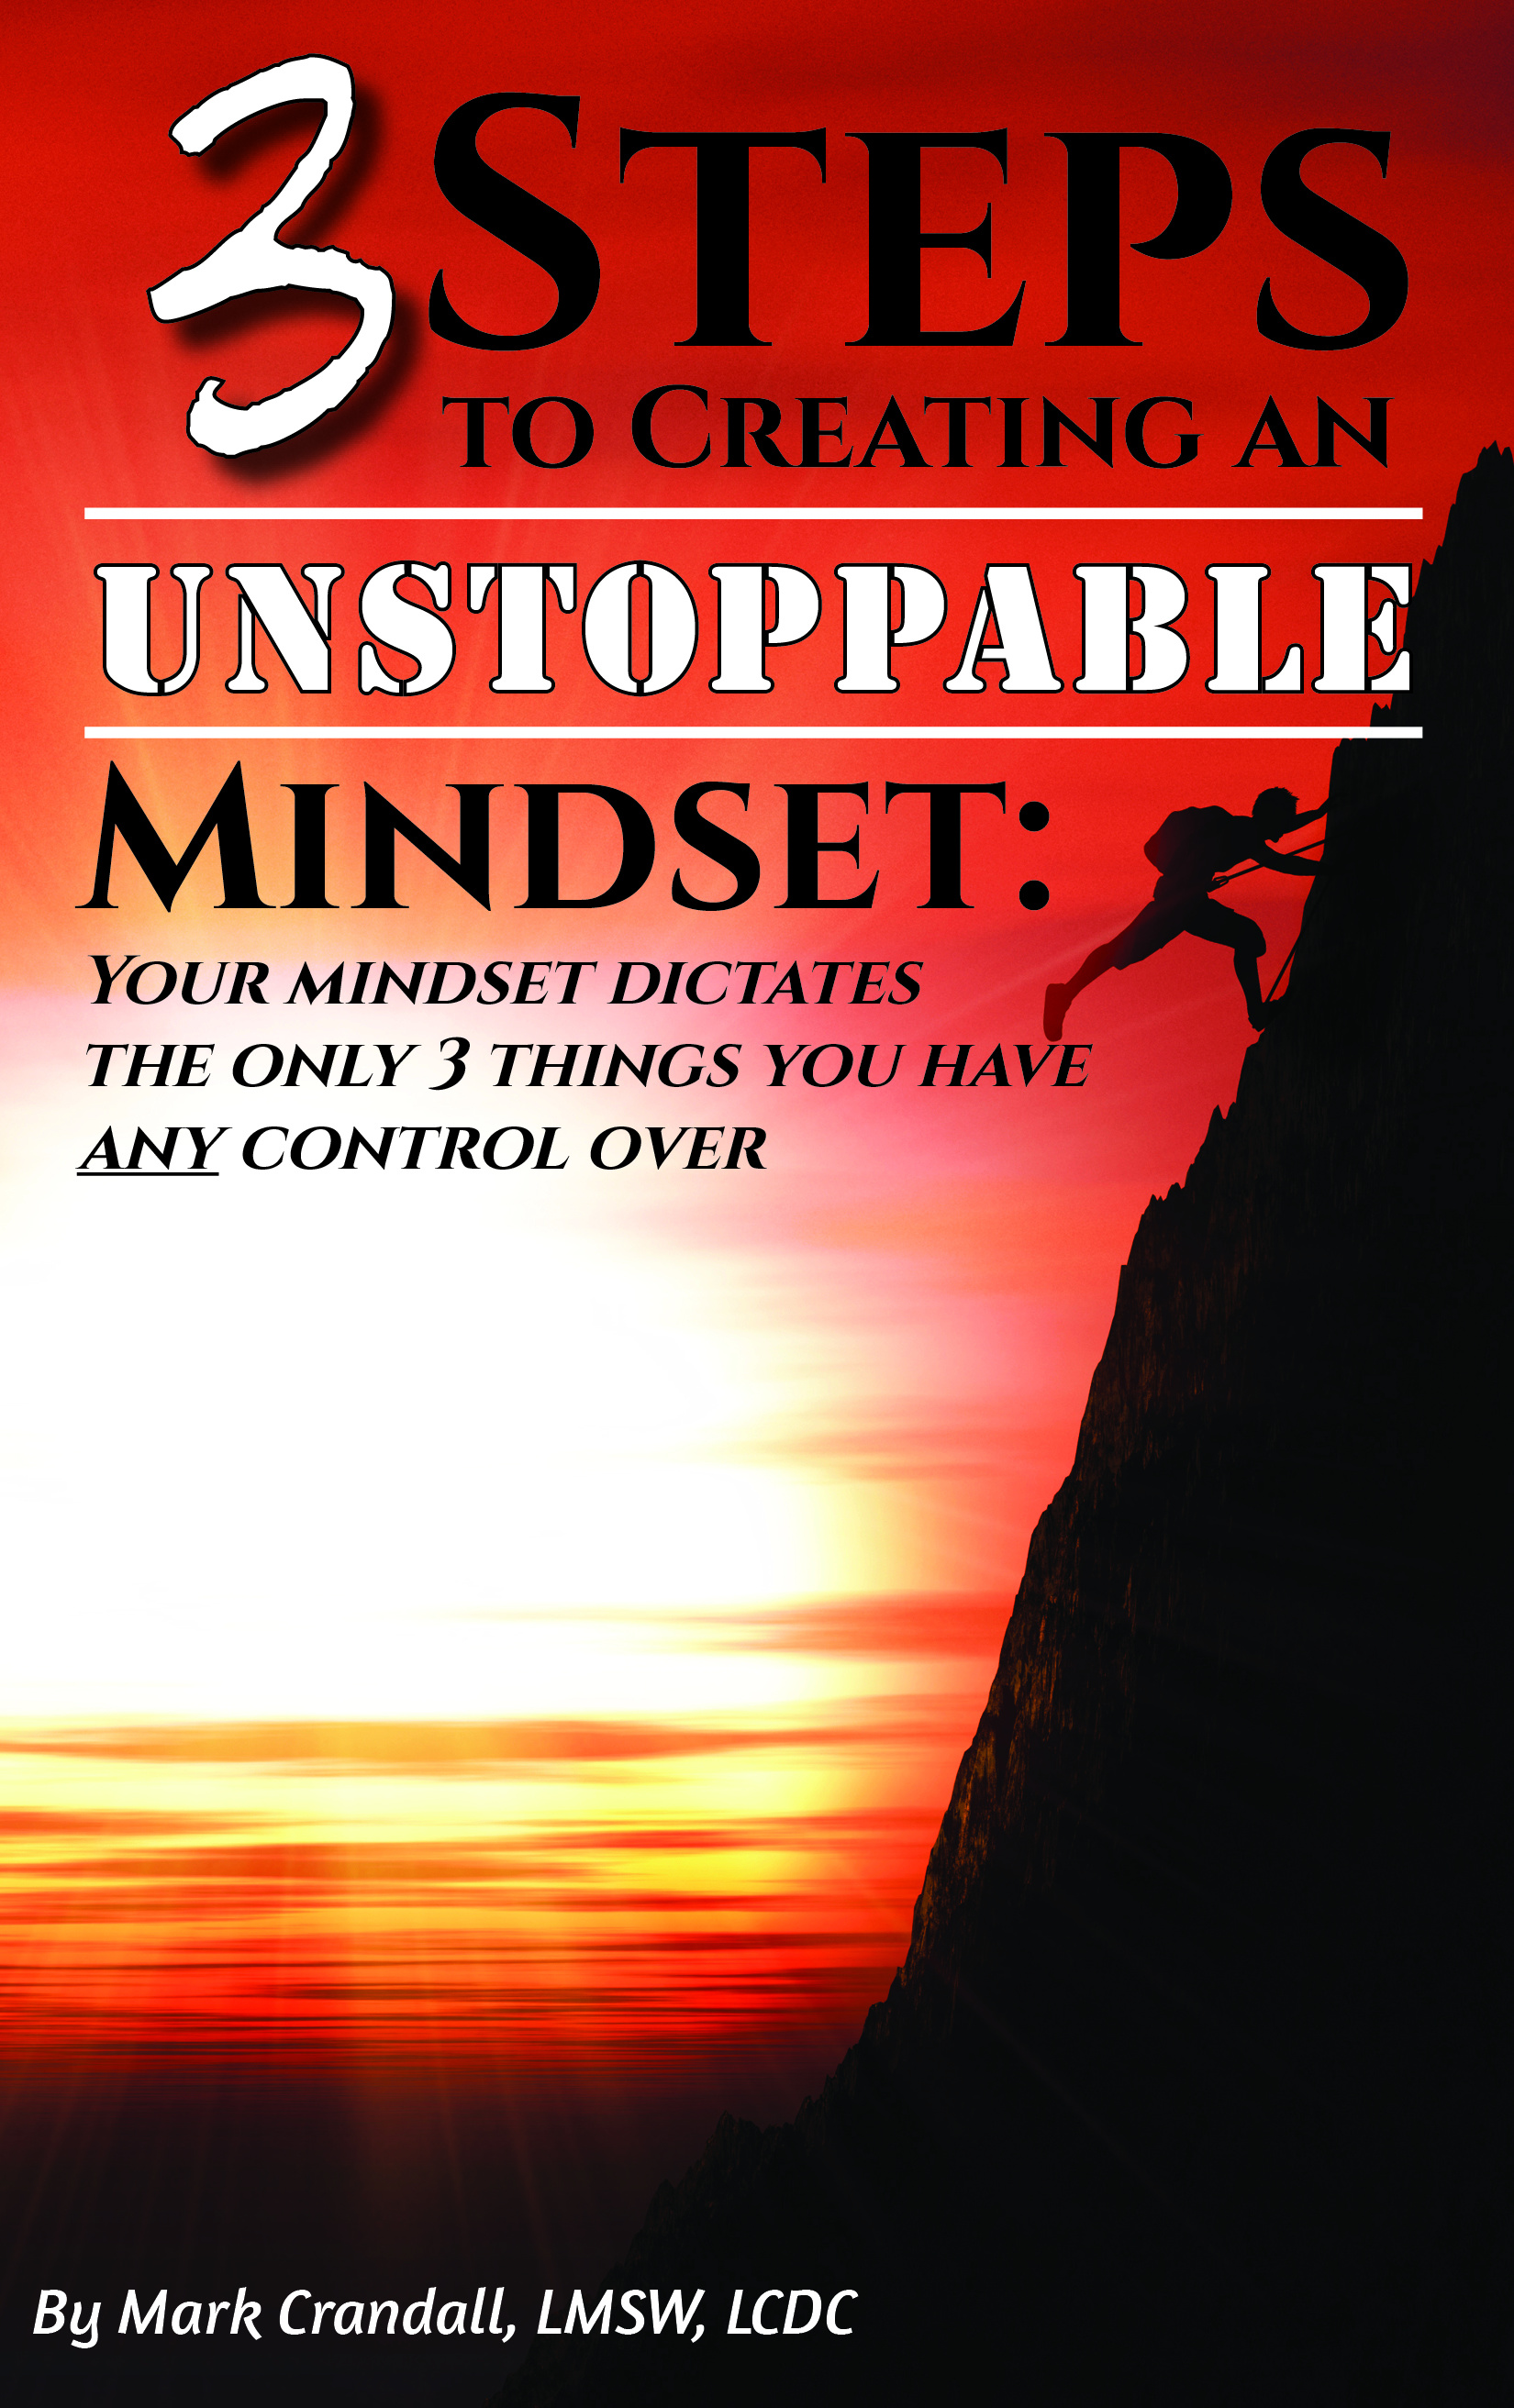 3 Steps eBook Cover